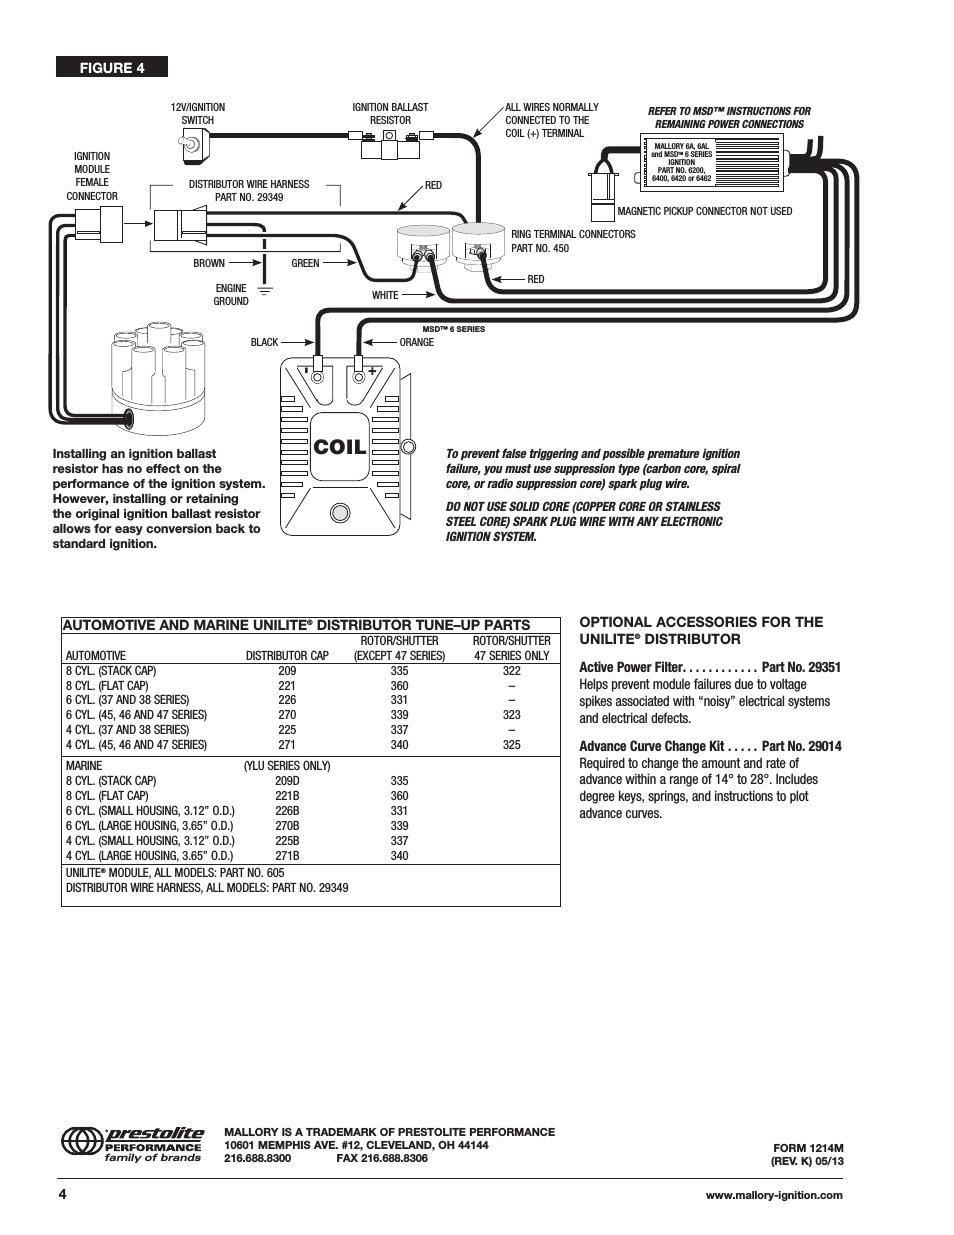 medium resolution of mallory ignition wiring diagram free wiring diagrammallory ignition wiring diagram coil mallory ignition mallory unilite distributor